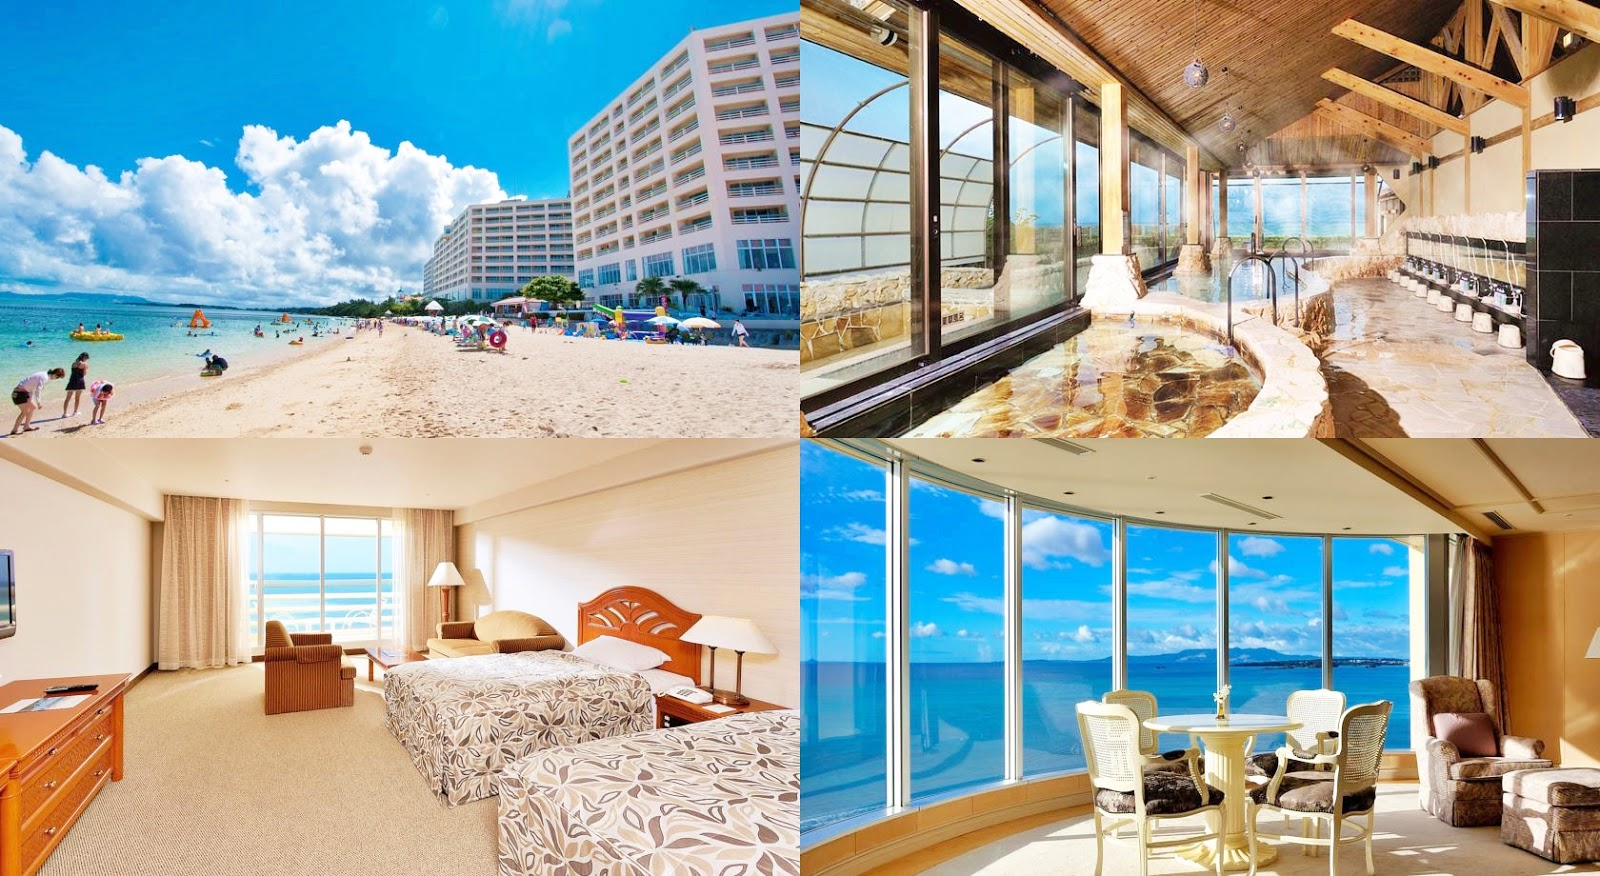 沖繩-住宿-推薦-麗山海景皇宮度假酒店-Rizzan-Sea-Park-Hotel-Tancha-Bay-Okinawa-hotel-recommendation